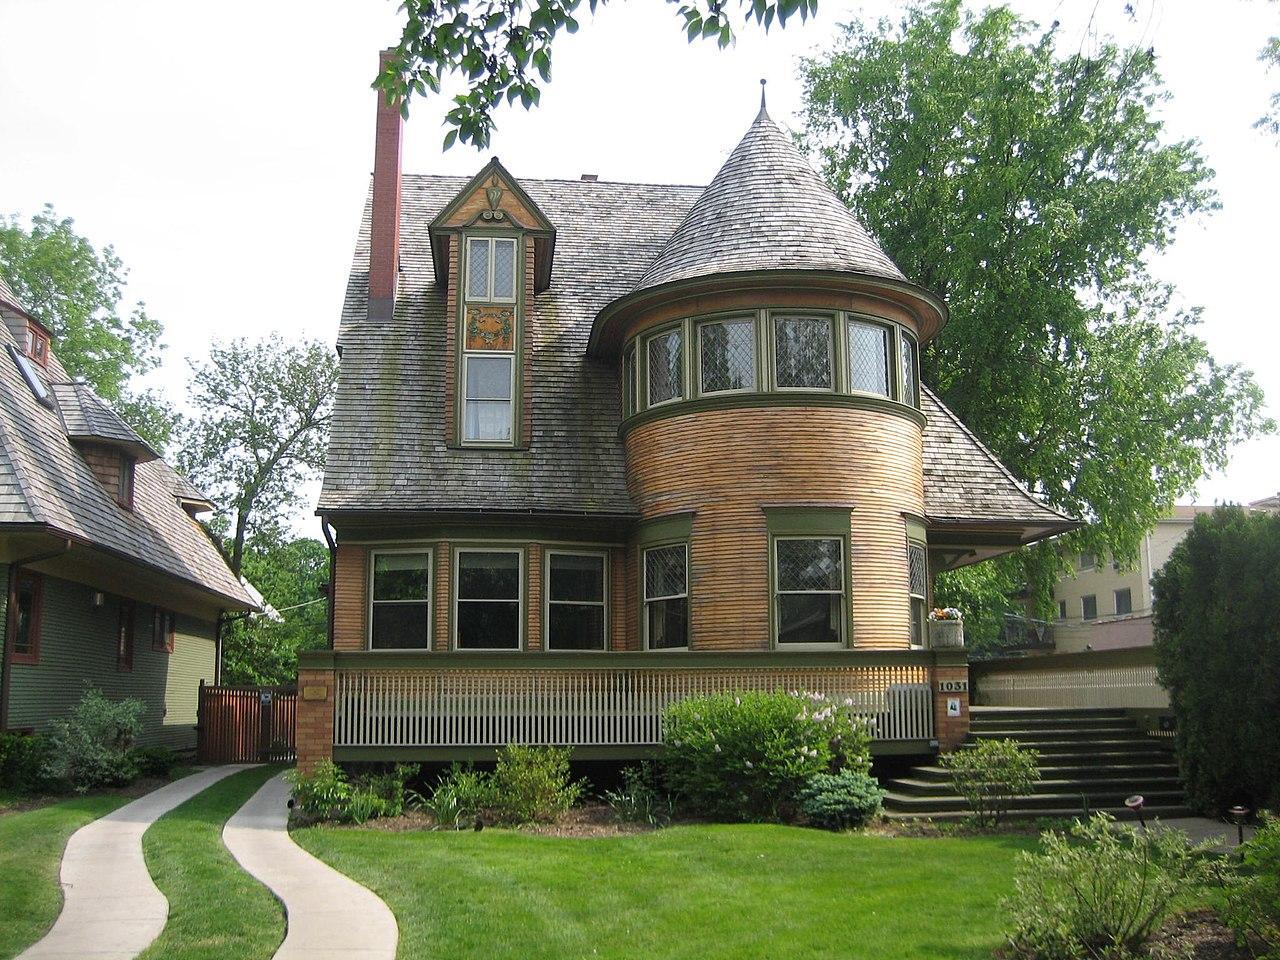 File:Oak Park Il Walter Gale House4.jpg - Wikimedia Commons